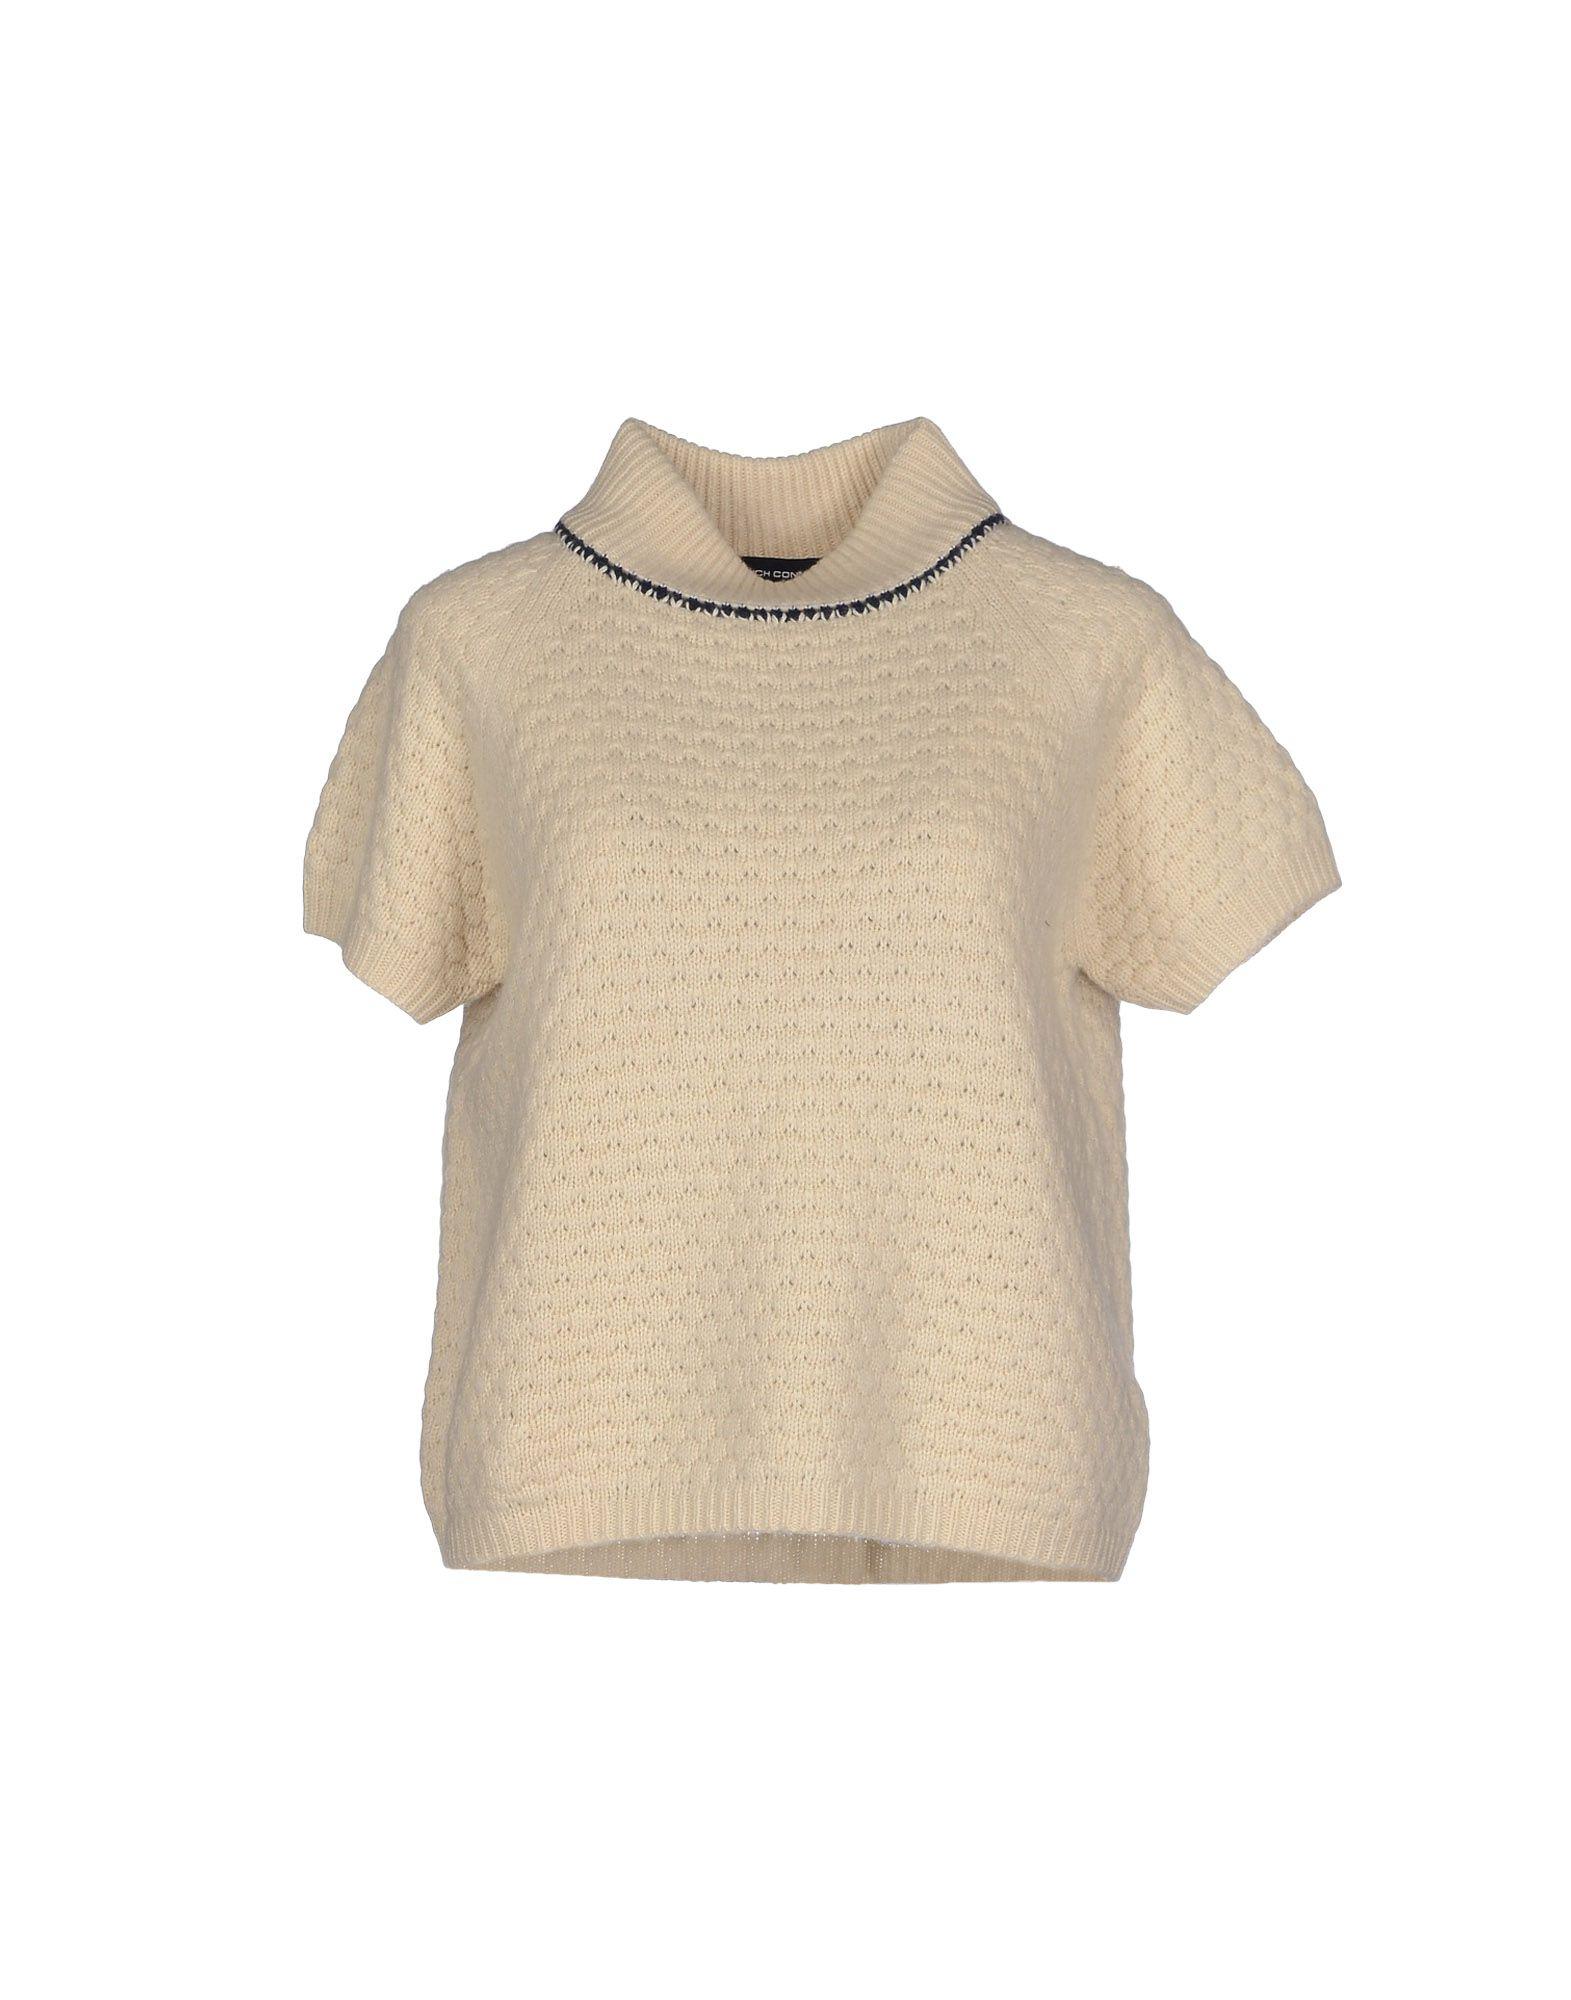 1x Cashmere Sweater 44